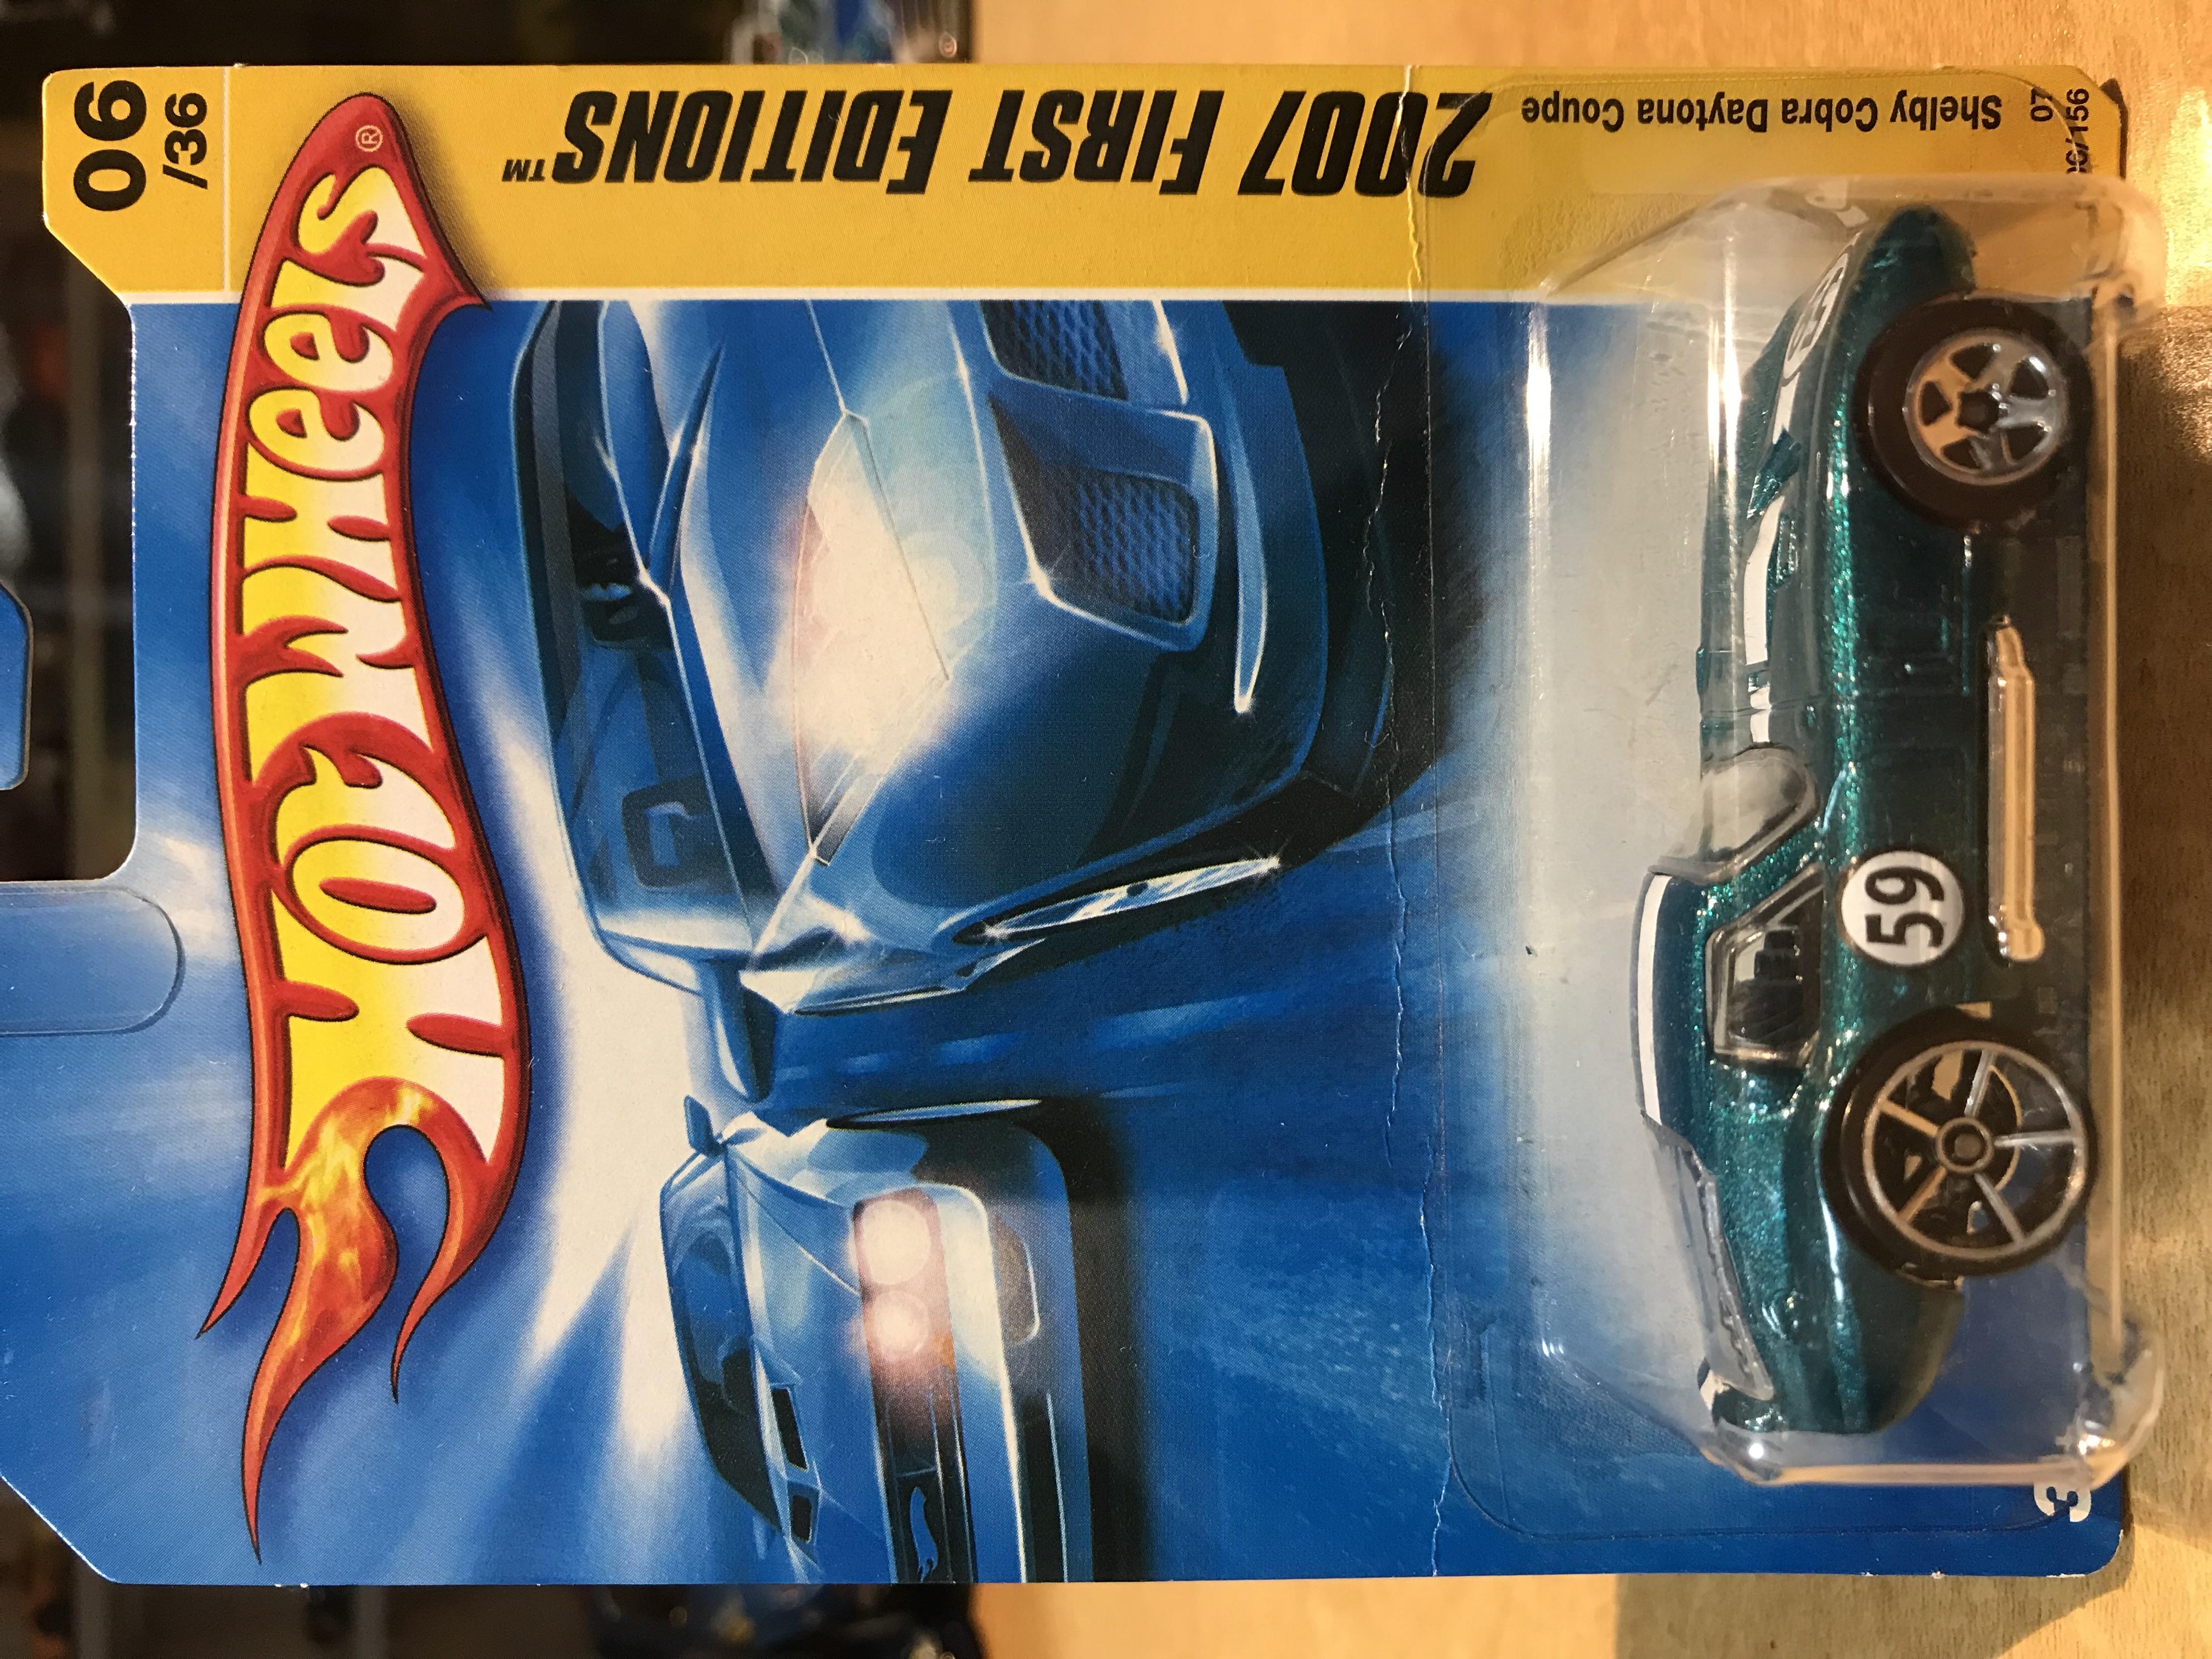 Hot Wheels Shelby Cobra Daytona Coupe 2007 New Models Silver